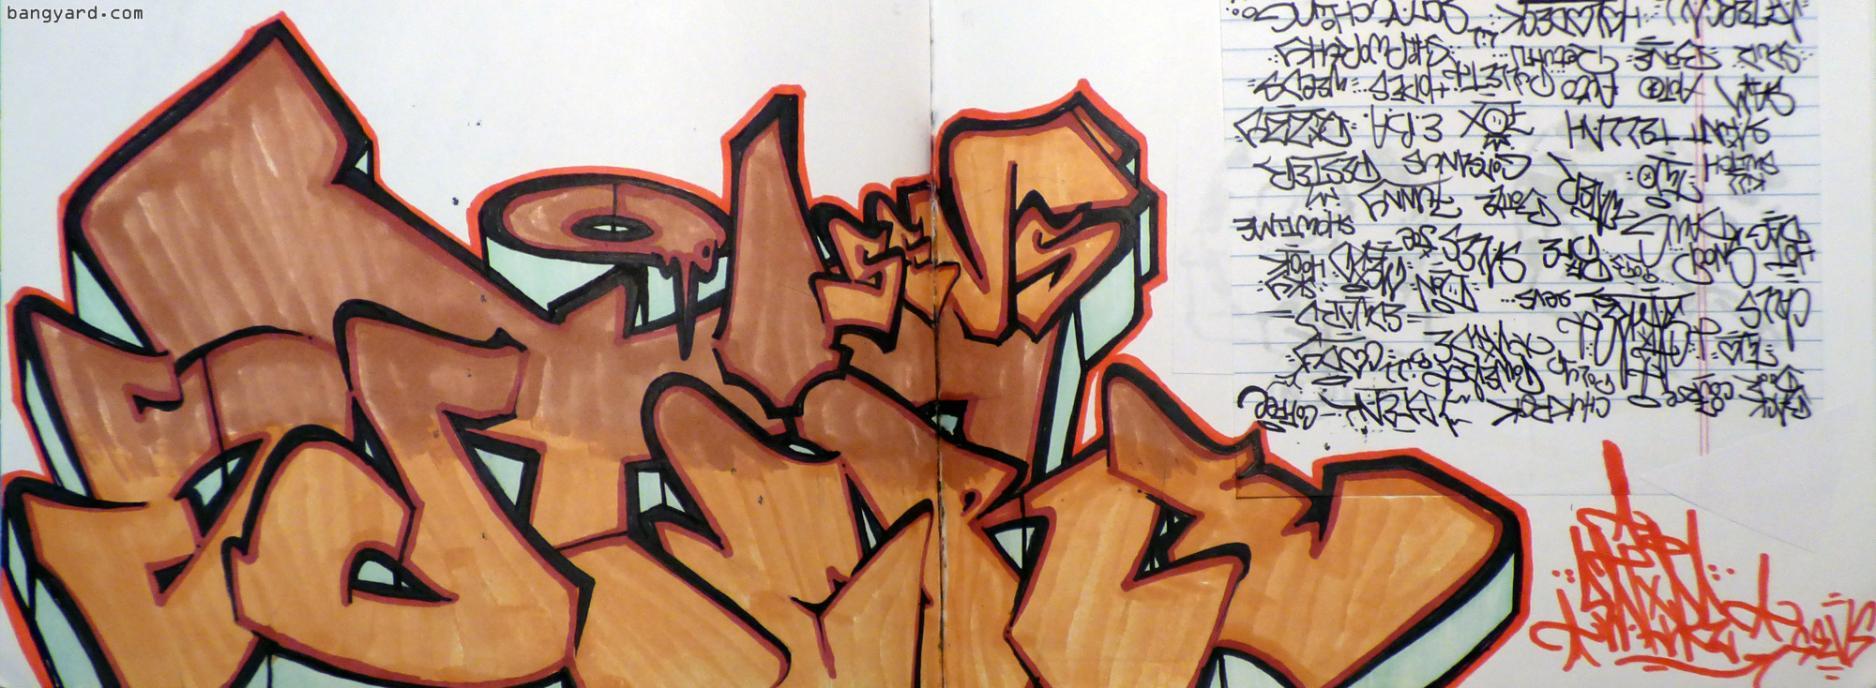 junk book brown.jpg